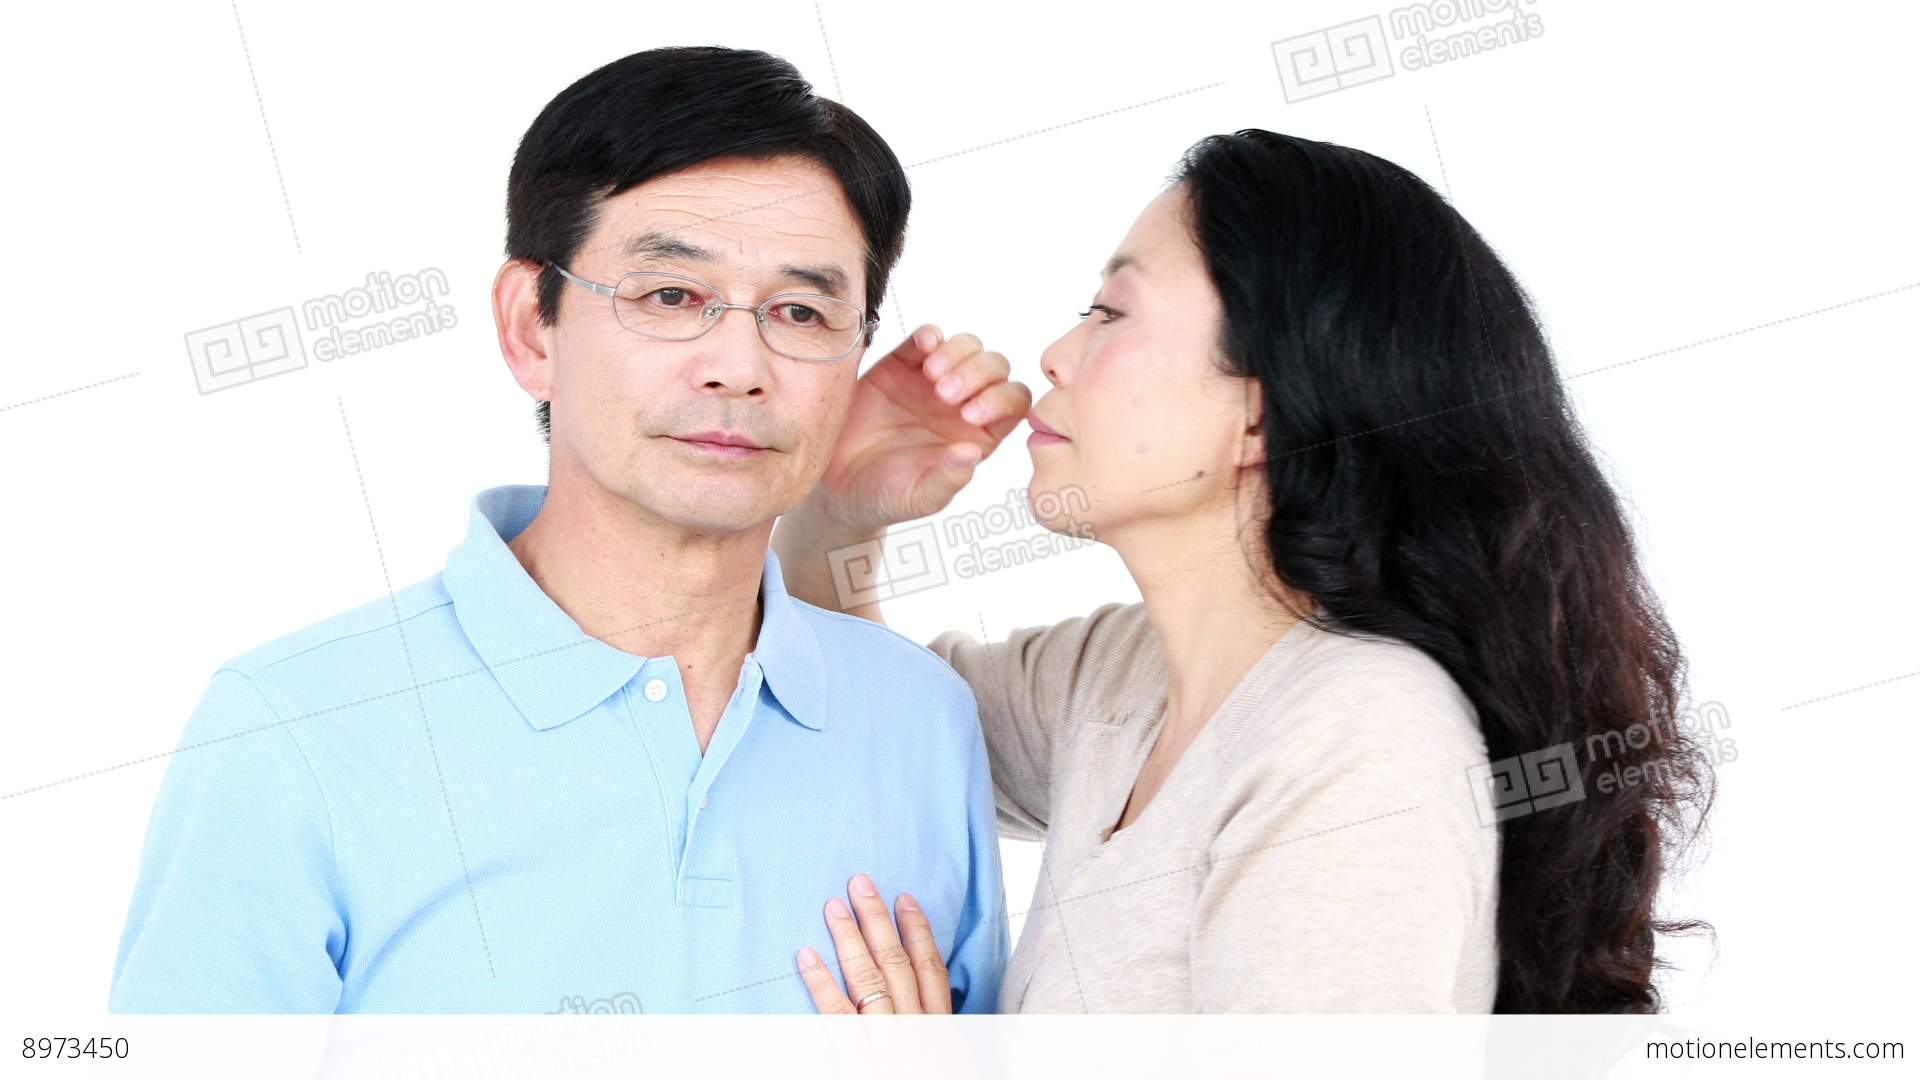 Playing com asian dating secrets